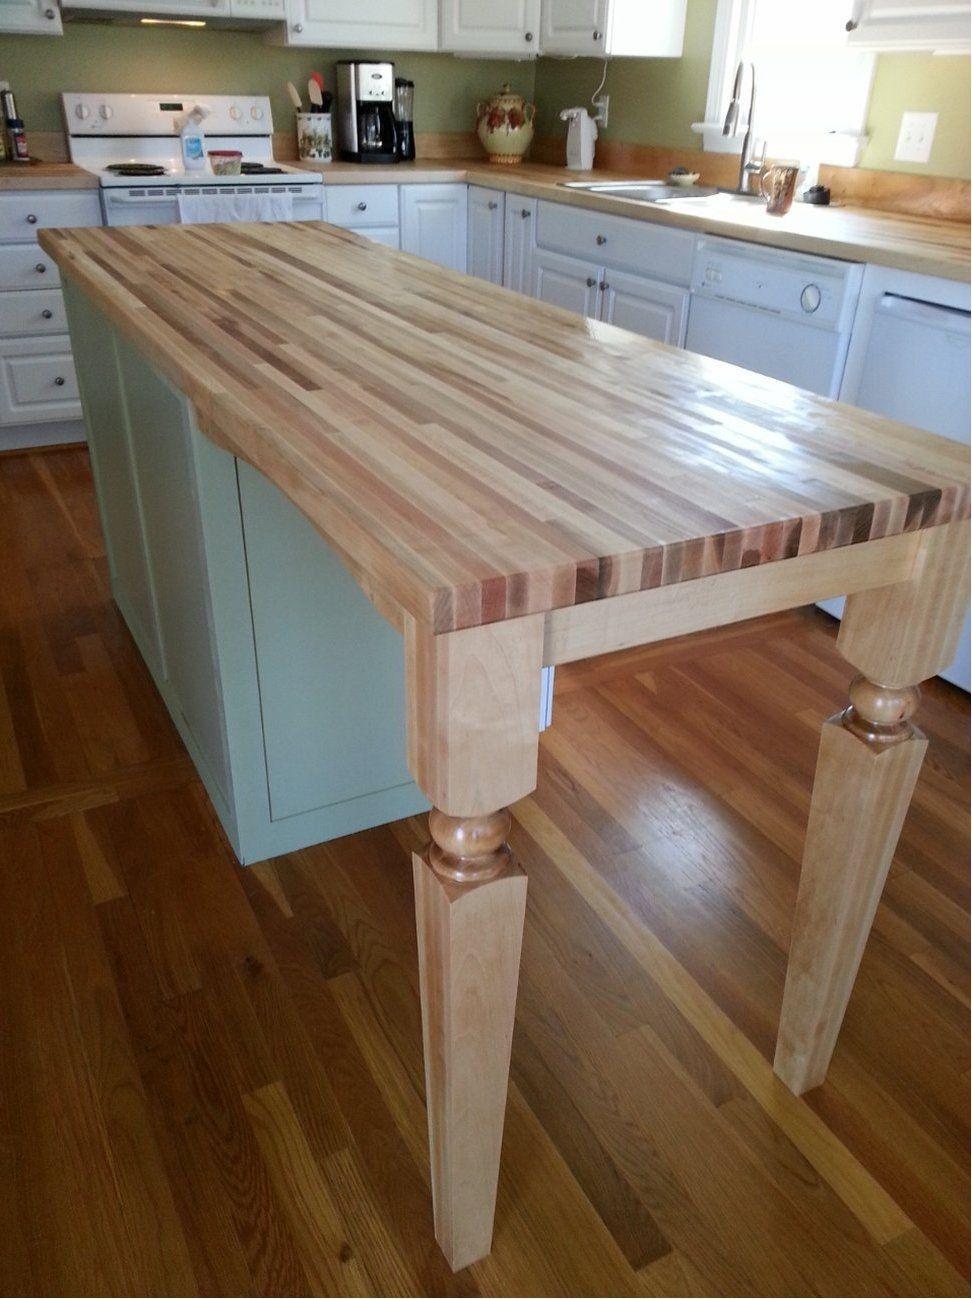 Wood Legs For Kitchen Island | http://navigator-spb.info | Pinterest ...